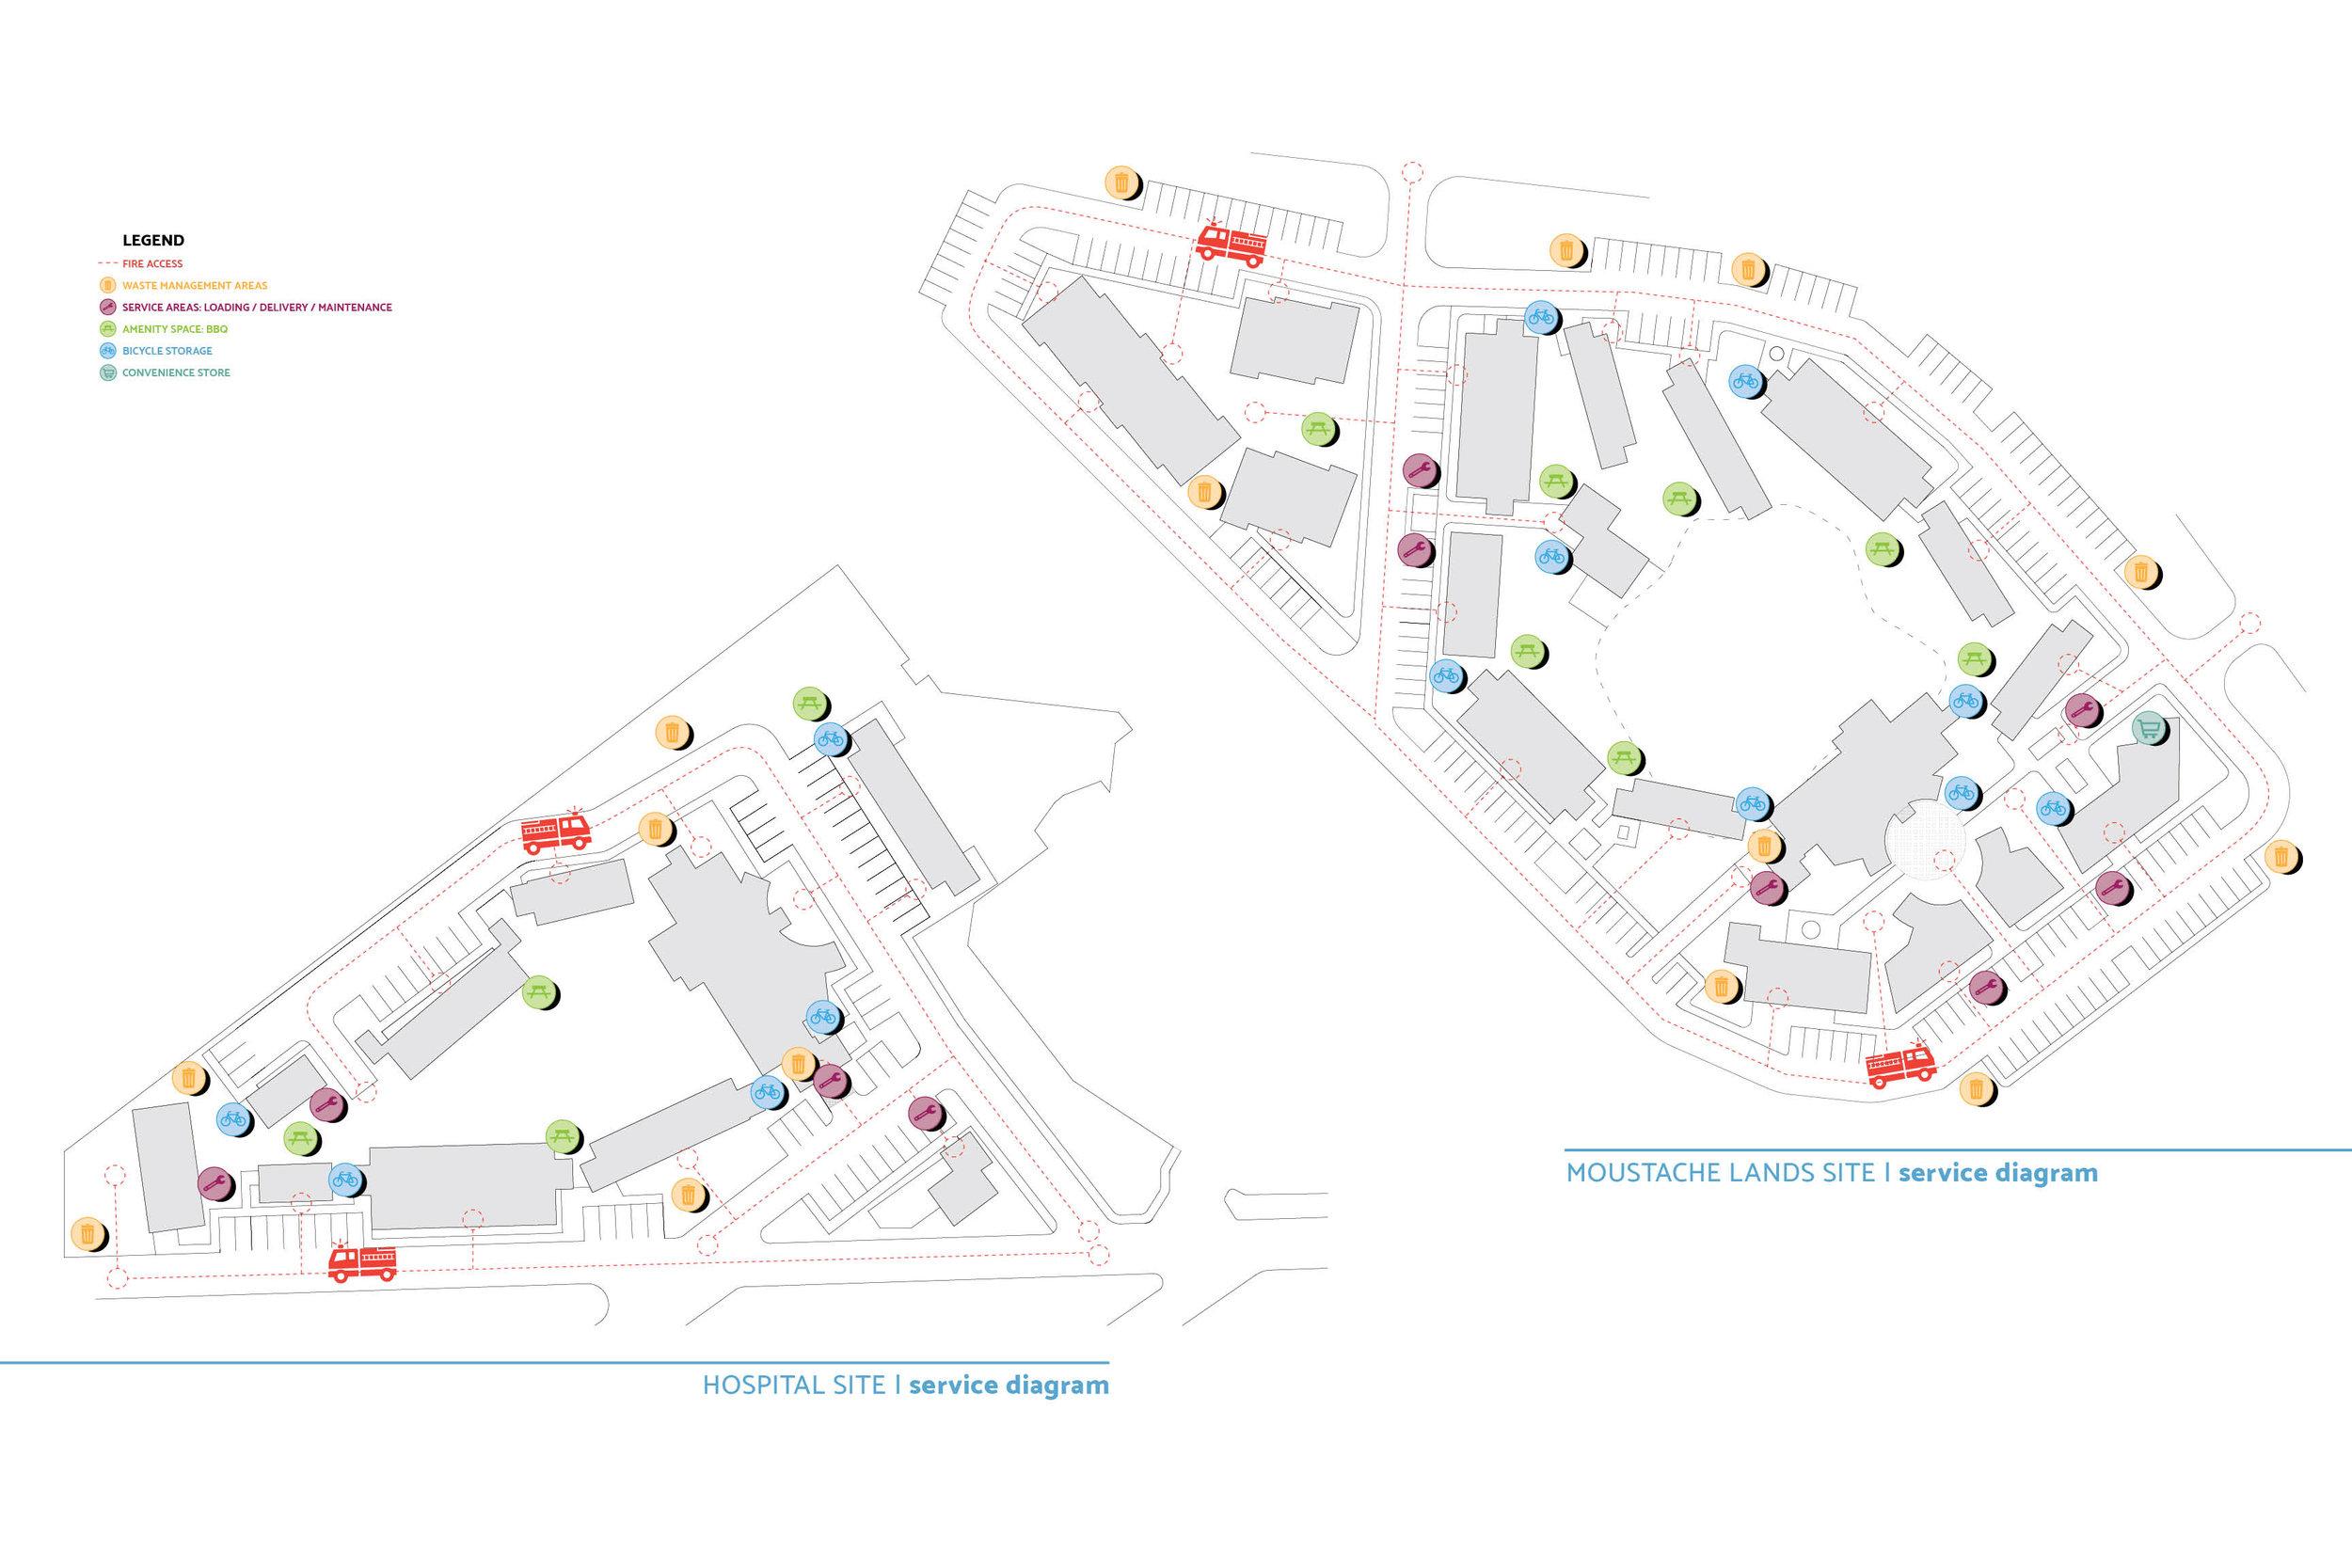 Masterplan Servicing Diagrams